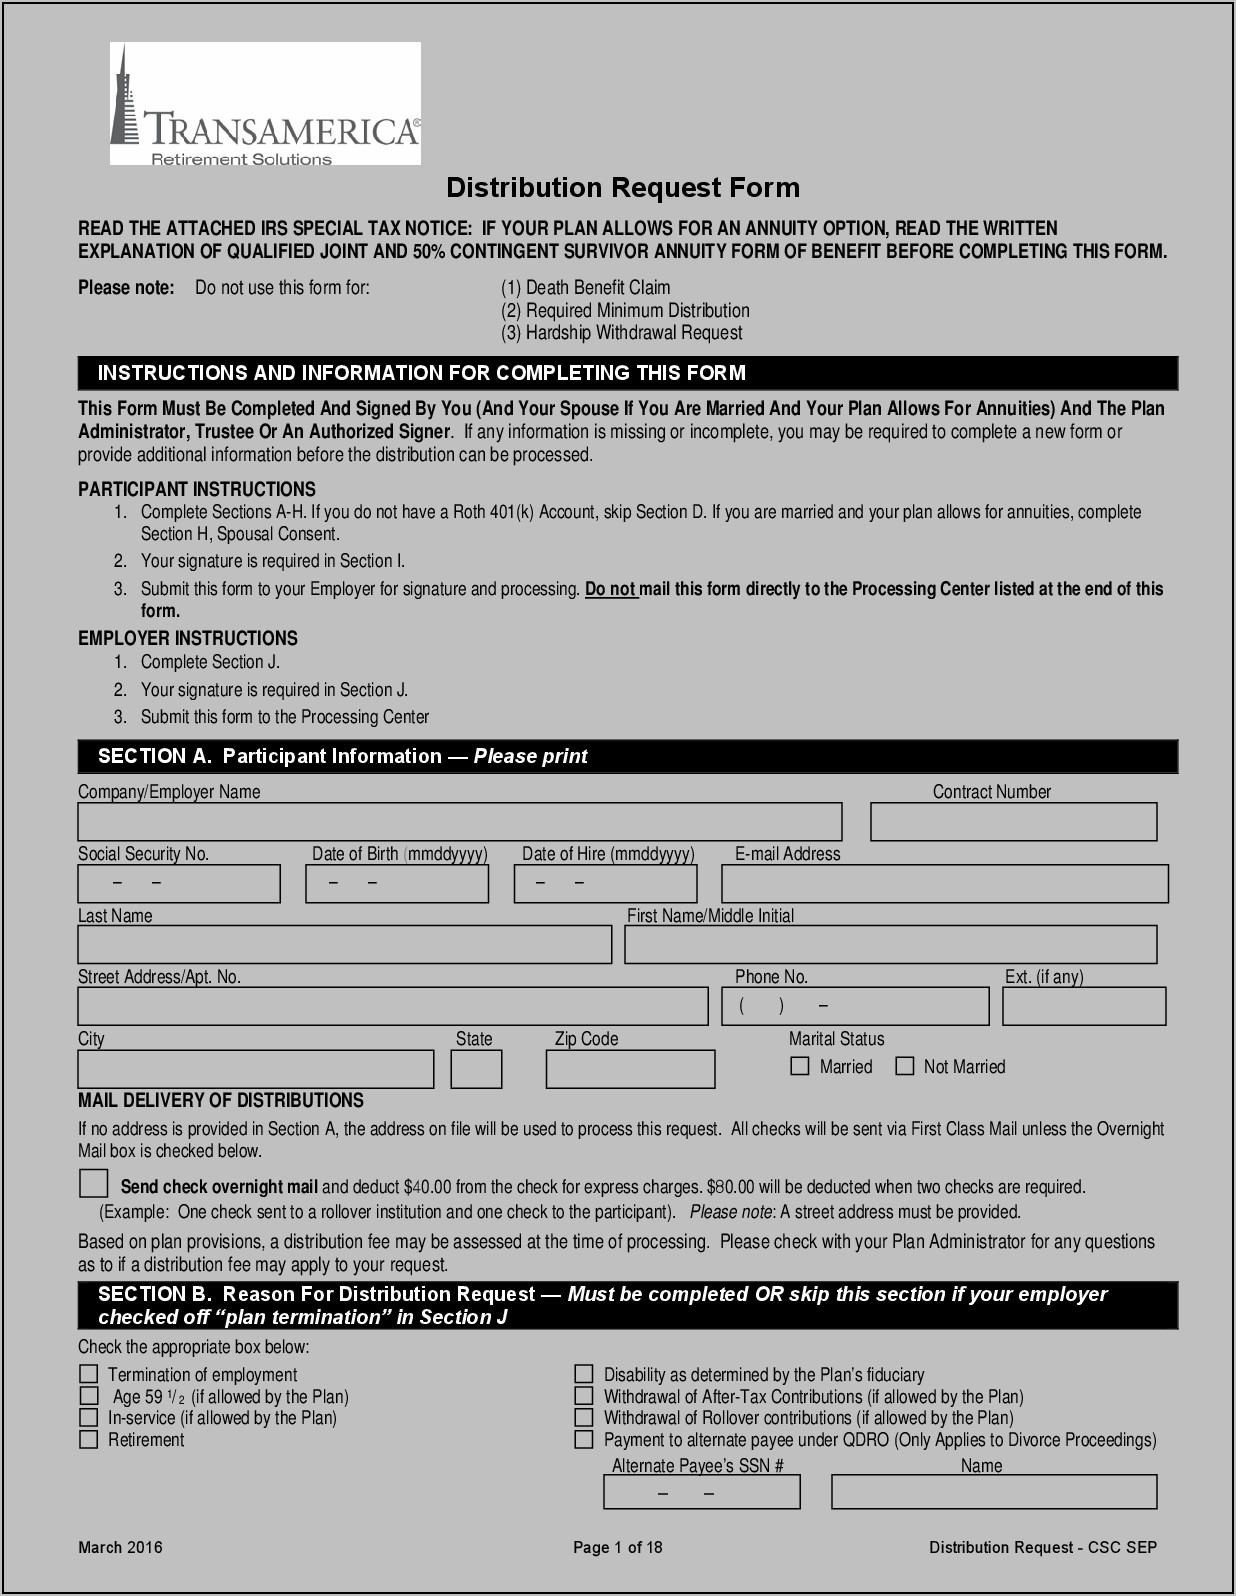 Paychex 401k Distribution Request Form